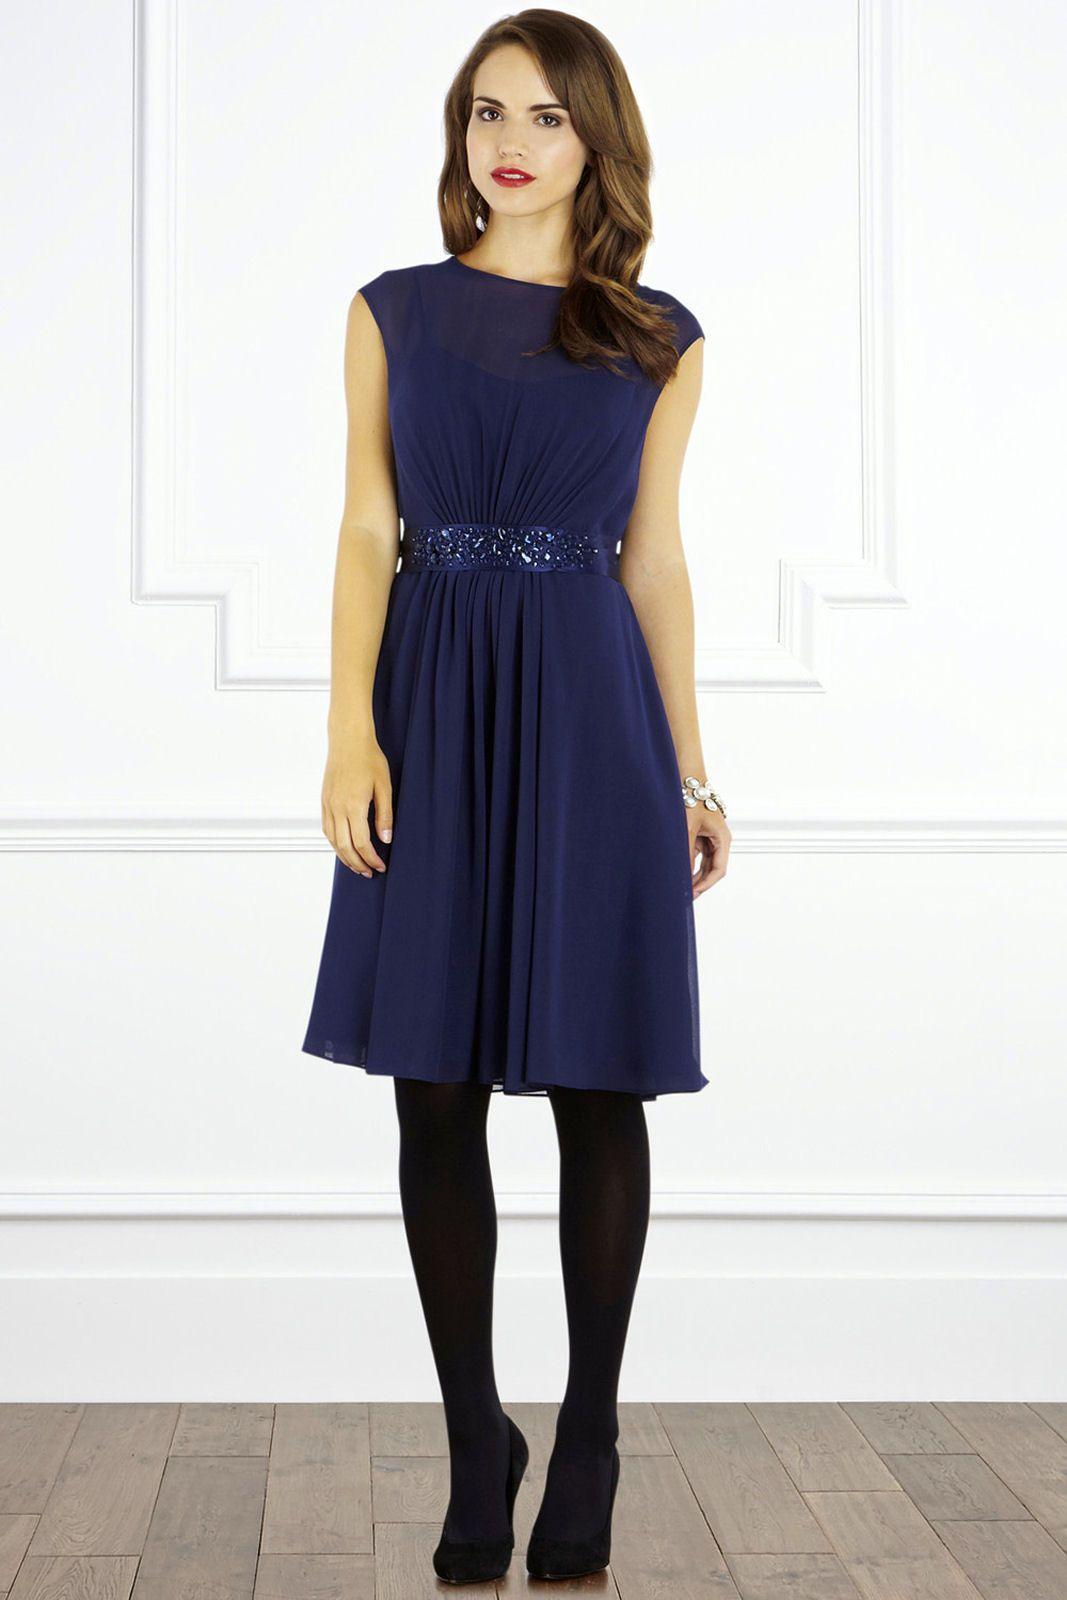 Cute Navy Blue Bridesmaid Dresses Fashall